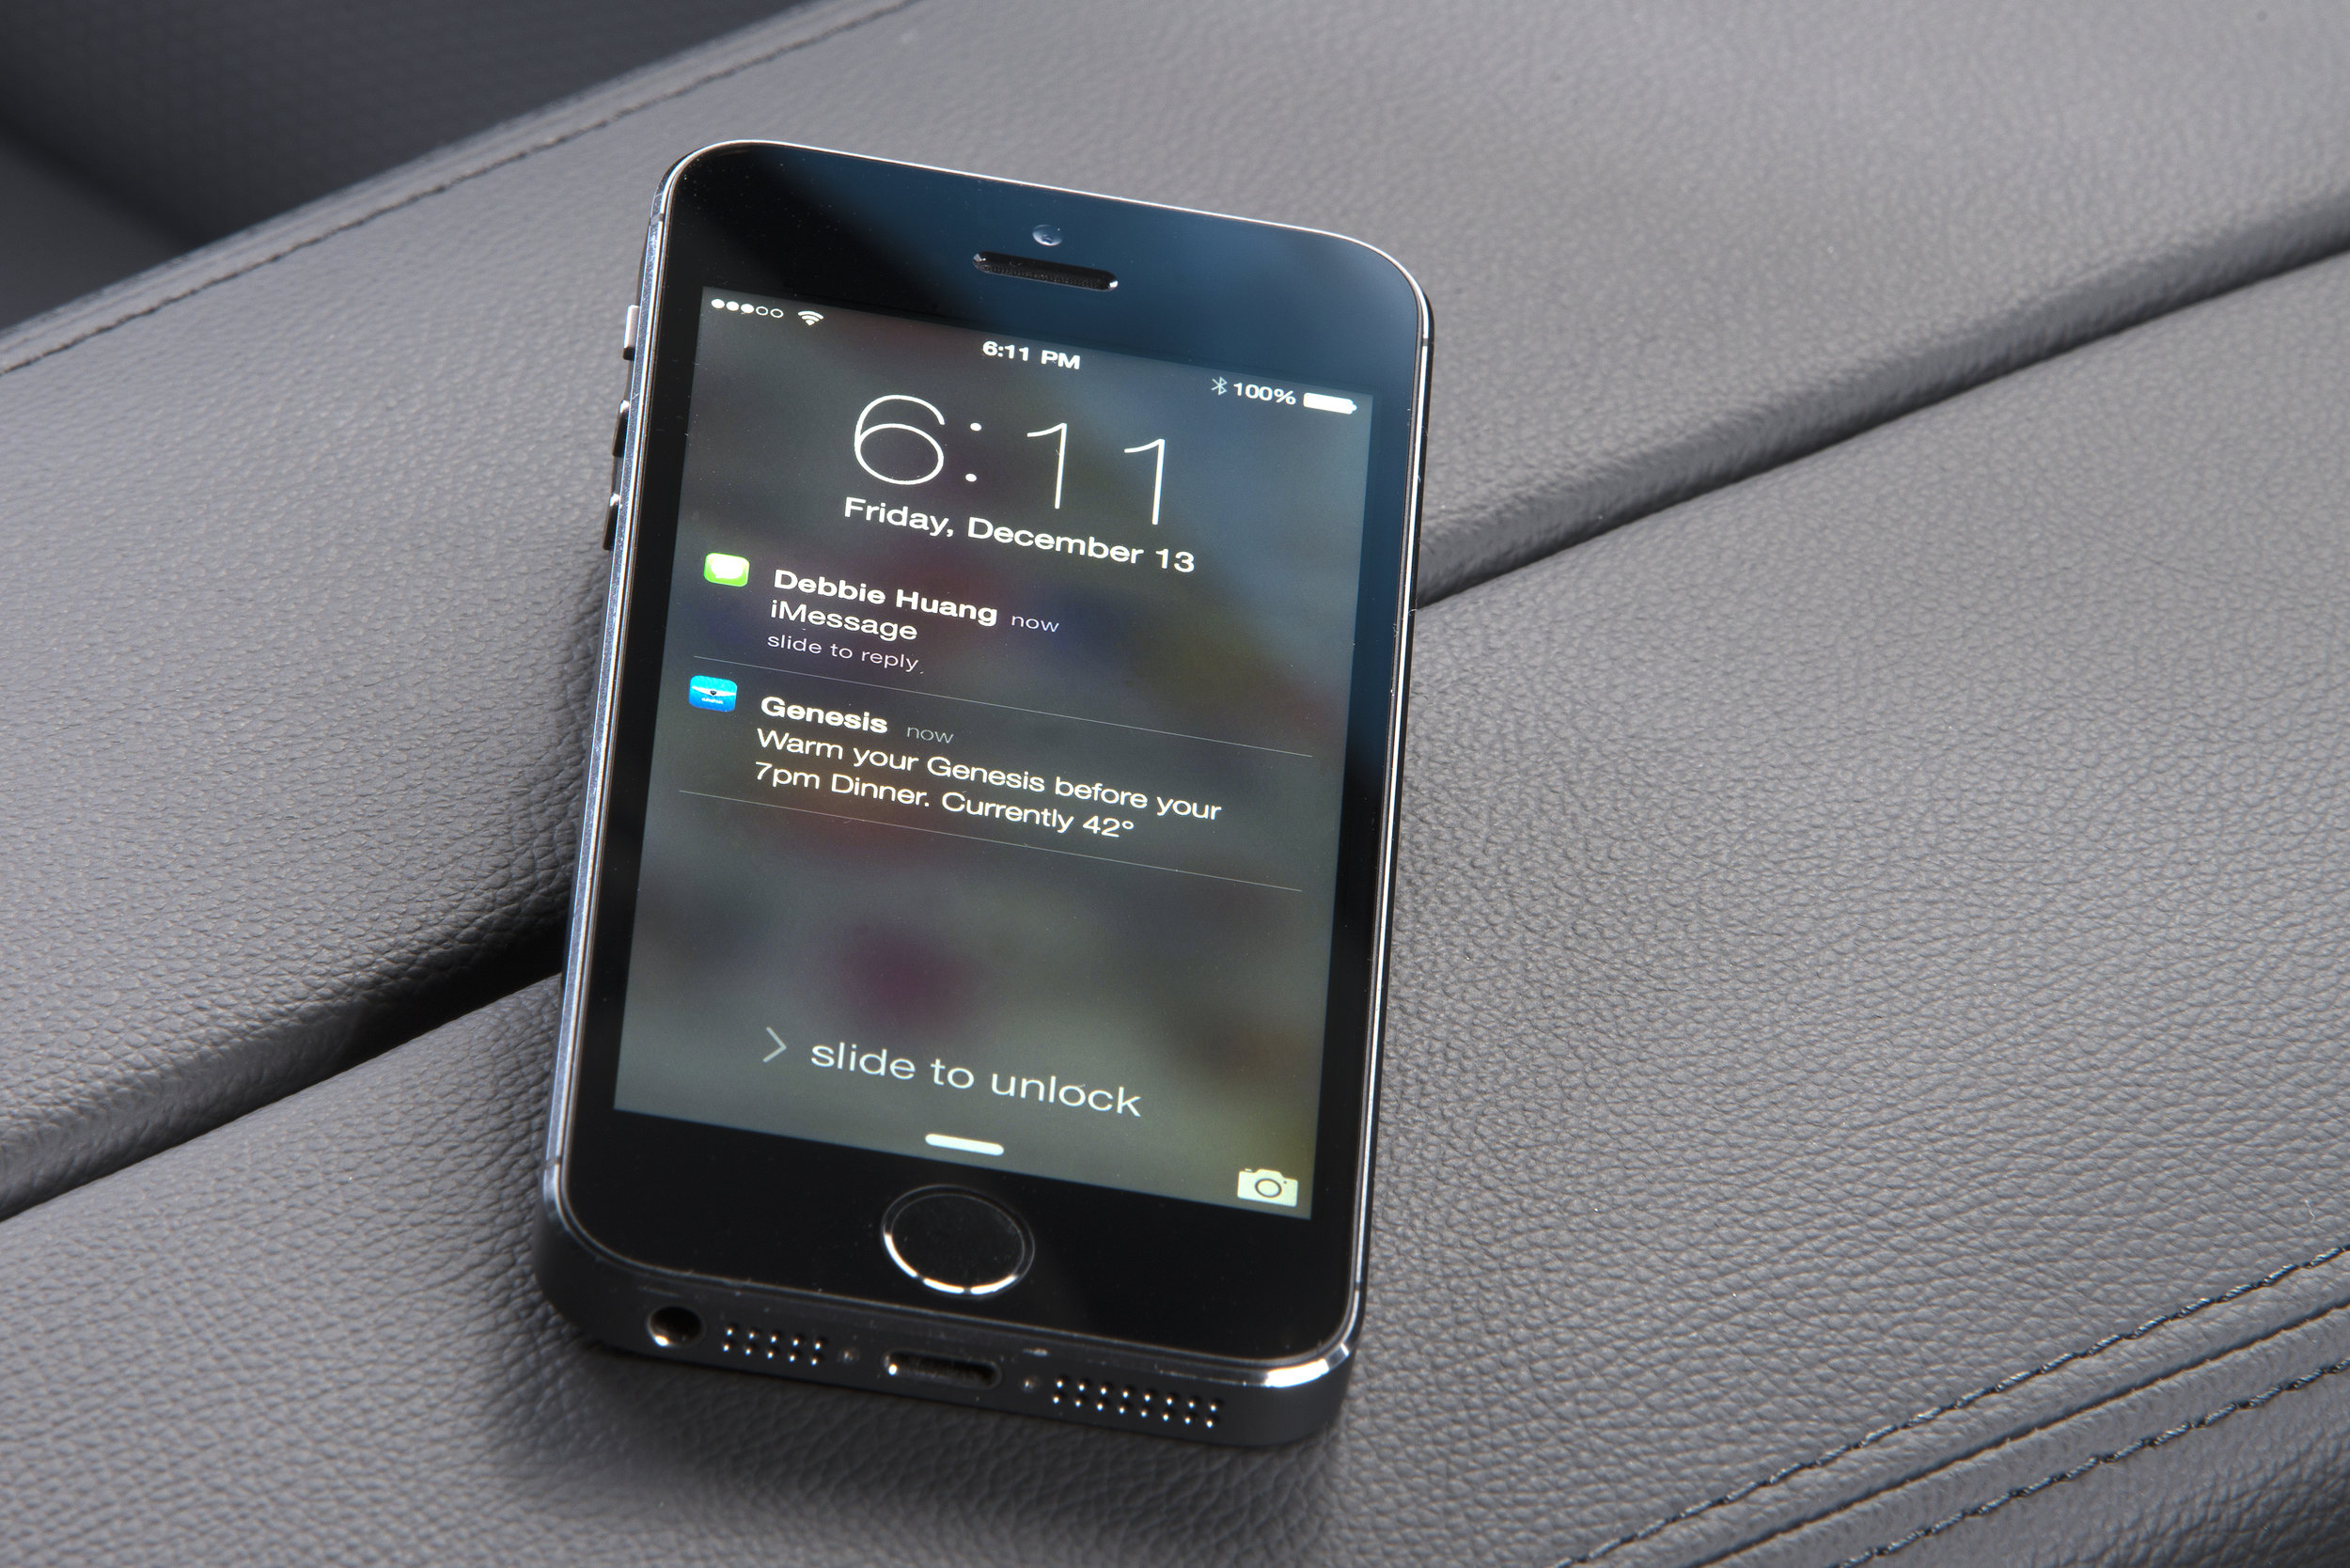 8591-HyundaiGenesisIntelligentAssistantApp.jpg